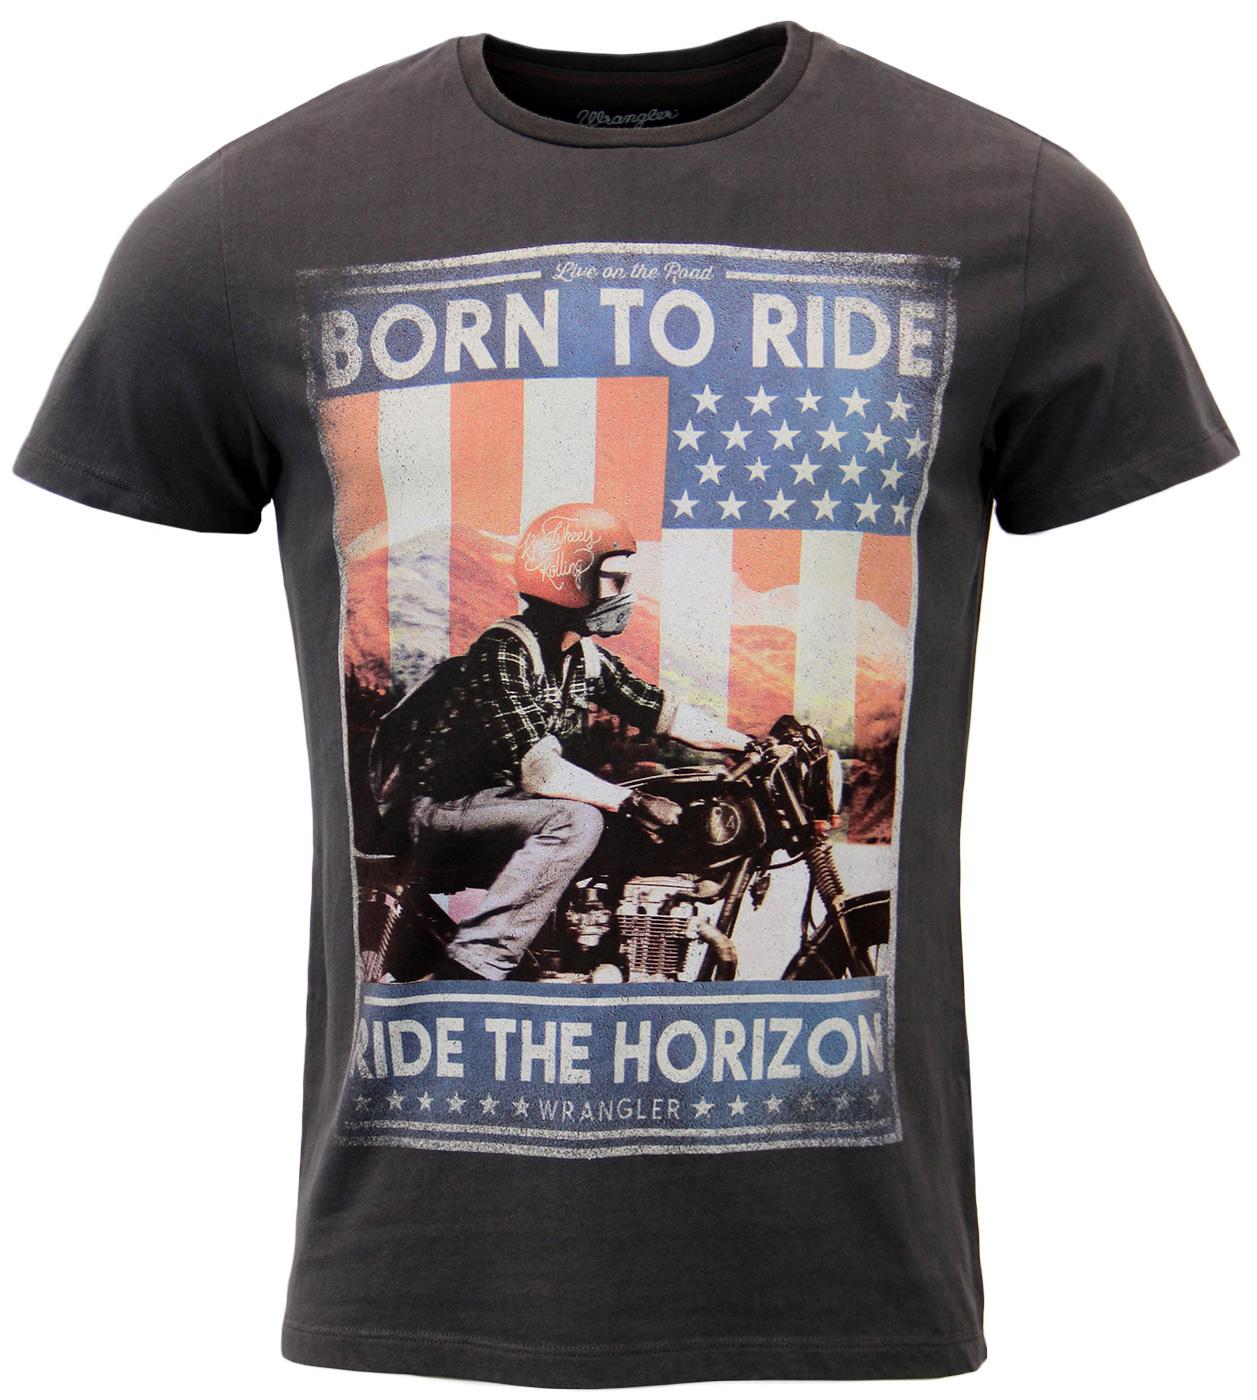 WRANGLER Retro Indie Born To Ride Jersey T-Shirt